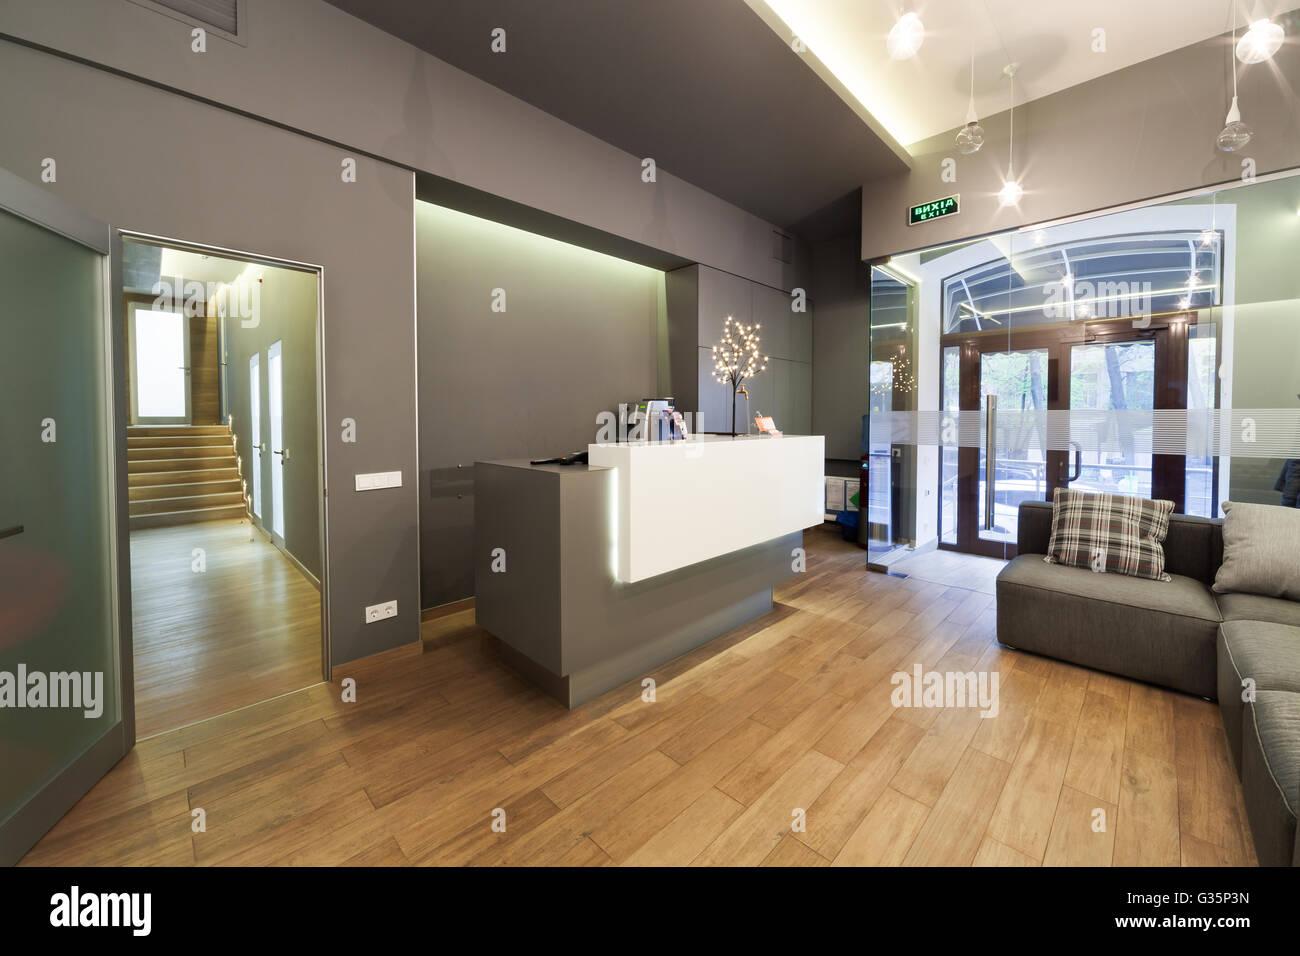 Architecture Interior Modern Reception Stockfotos & Architecture ...